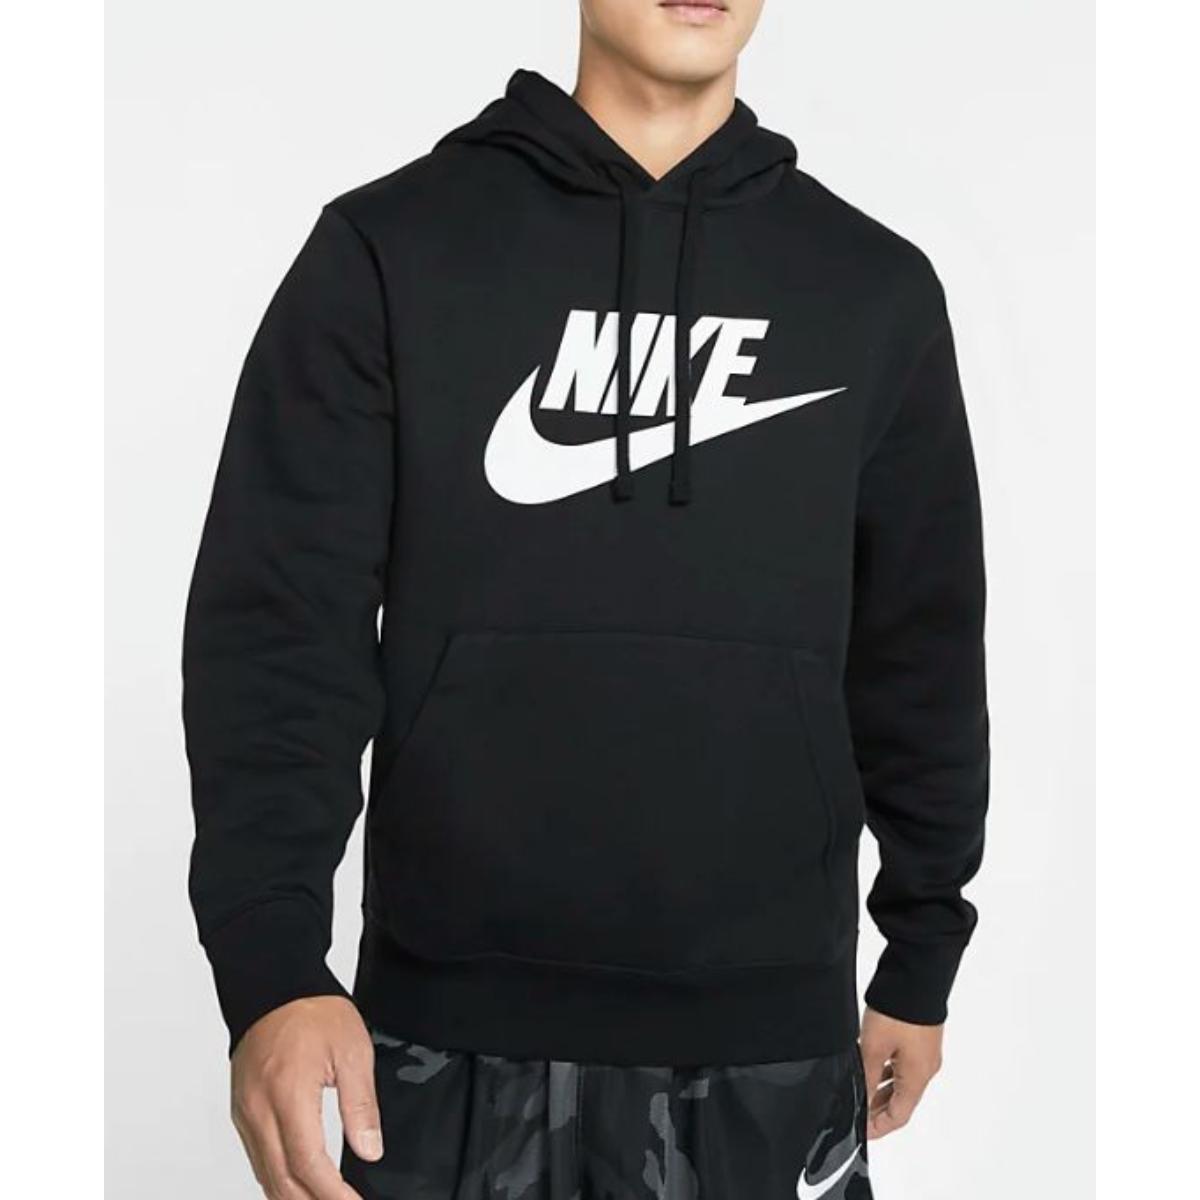 Blusão Masculino Nike Bv2973-010 Sportwear Preto